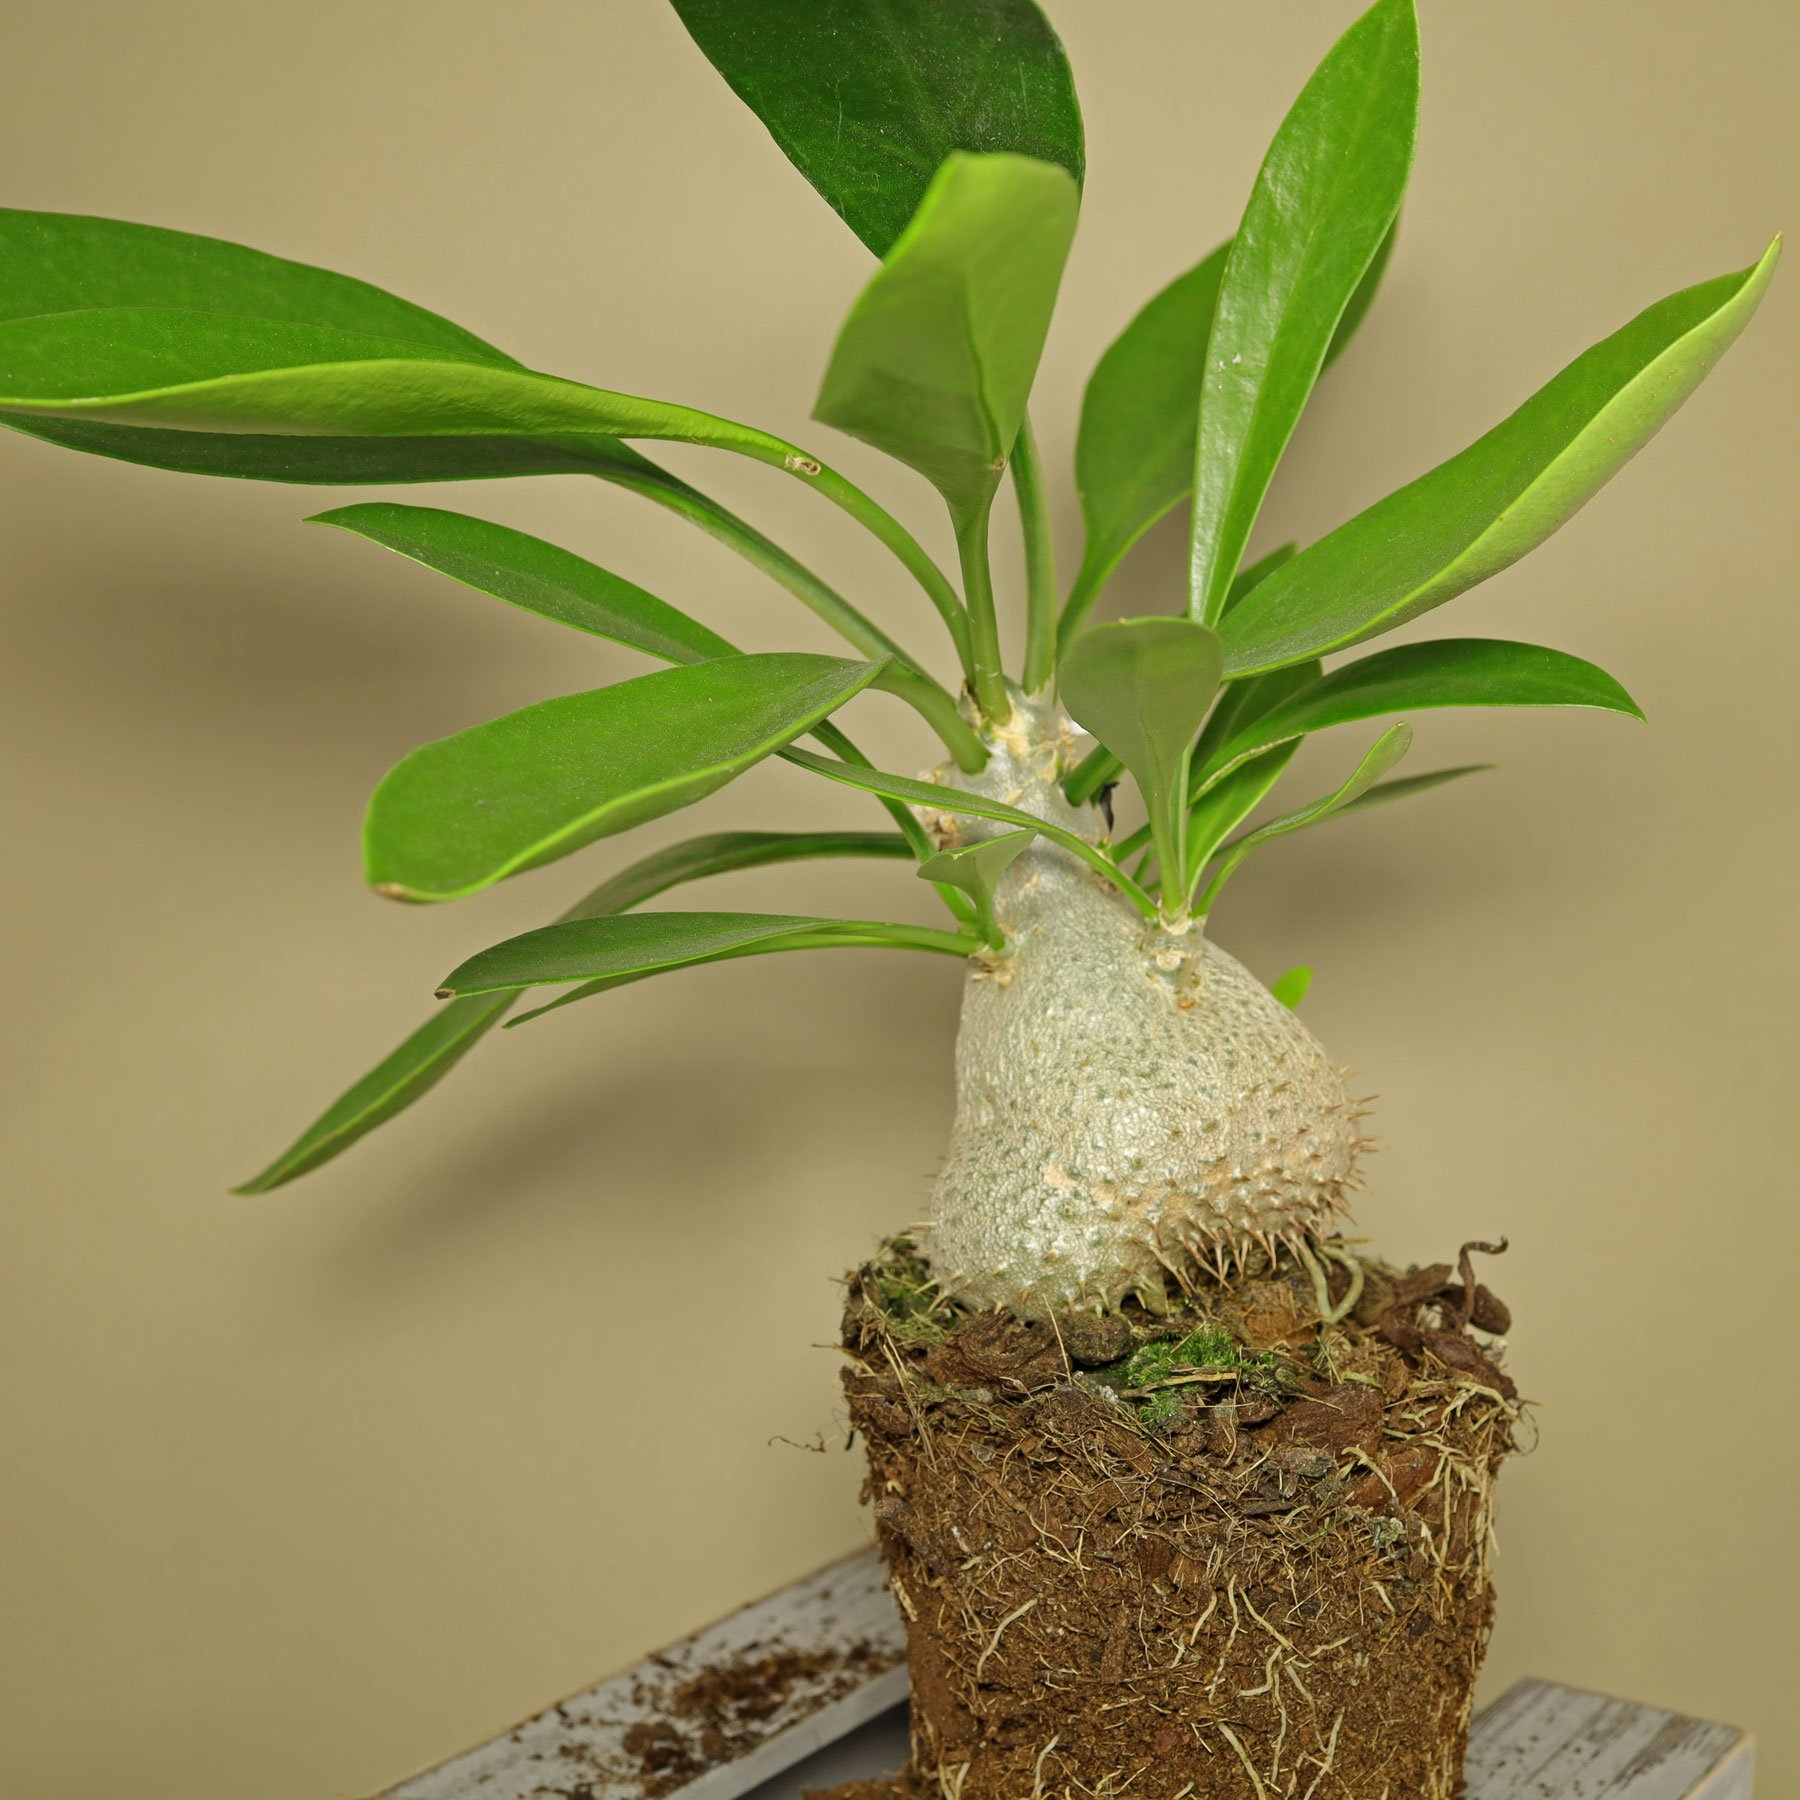 Ameisenpflanze Myrmecodia beccarii